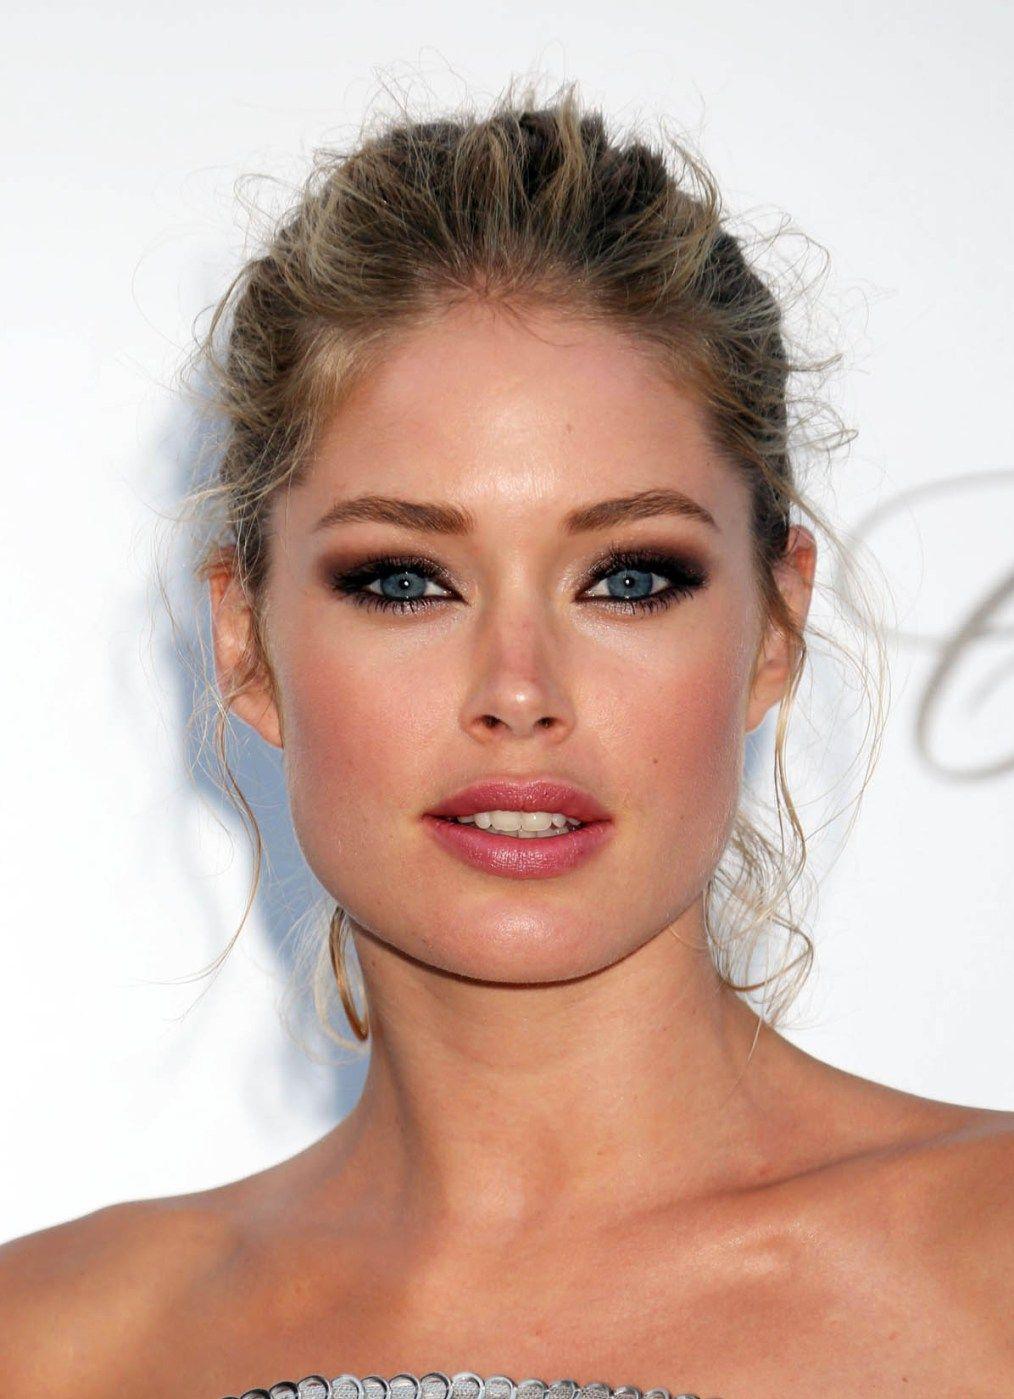 gorgeous smokey eye for blue eyes #beauty #doutzen #smokeyeye